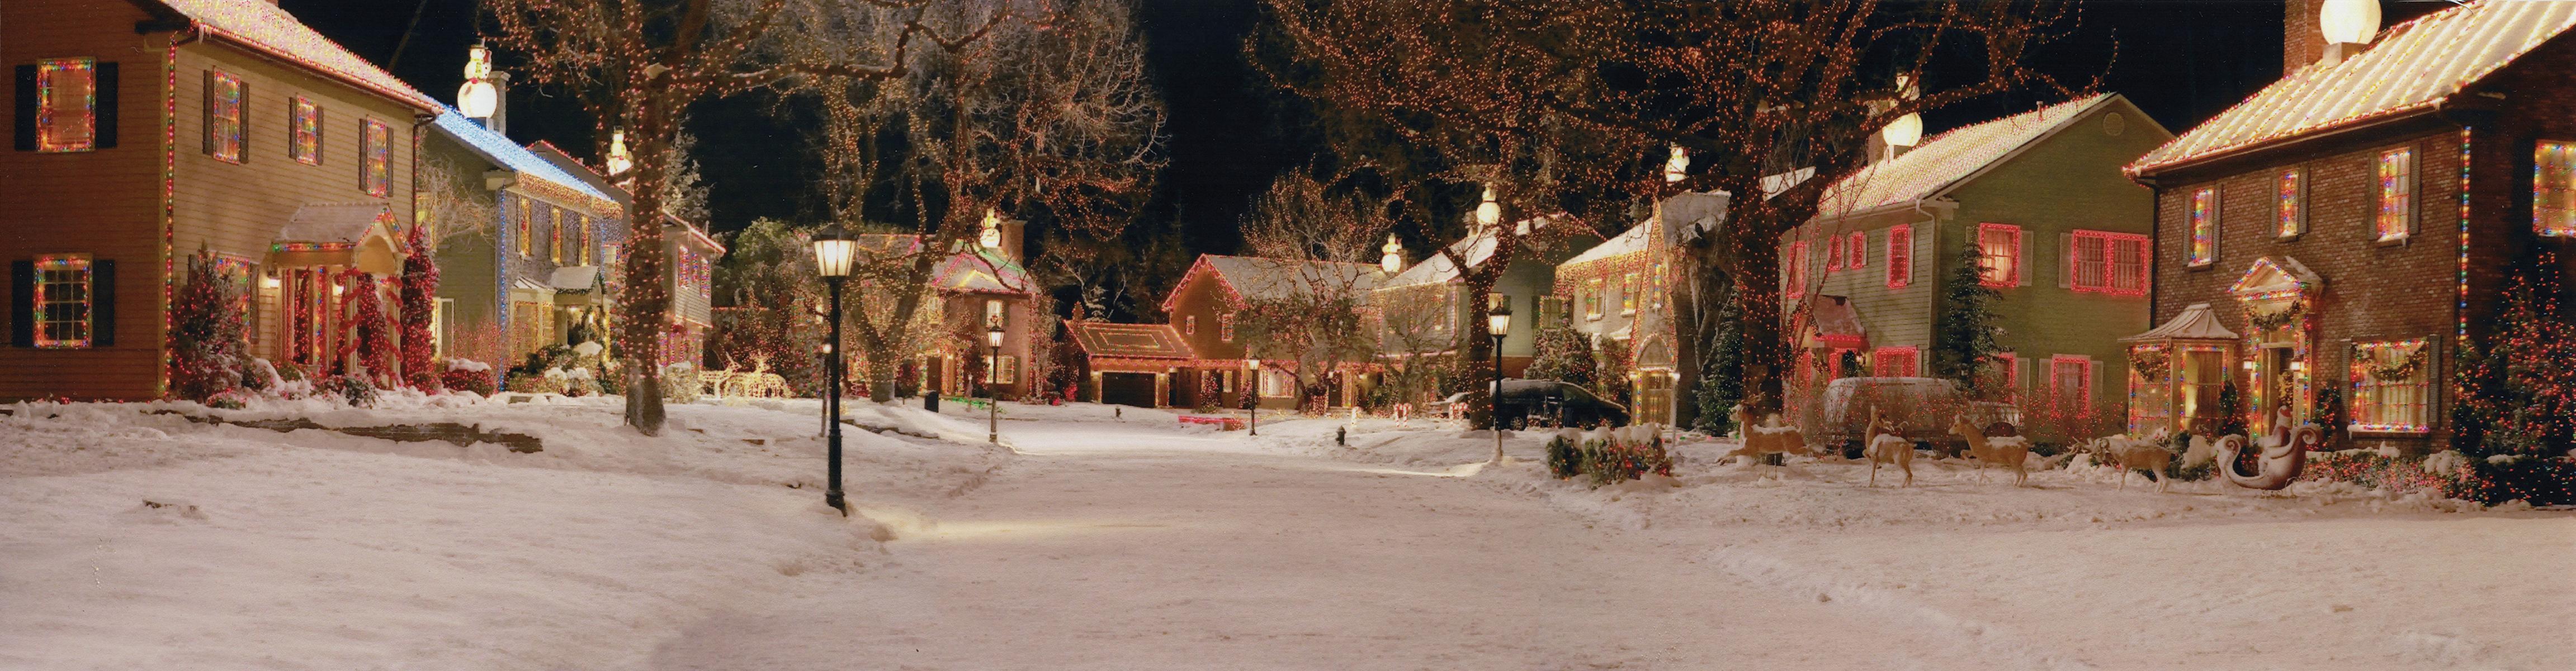 Christmas With The Kranks.Christmas With The Kranks 2004